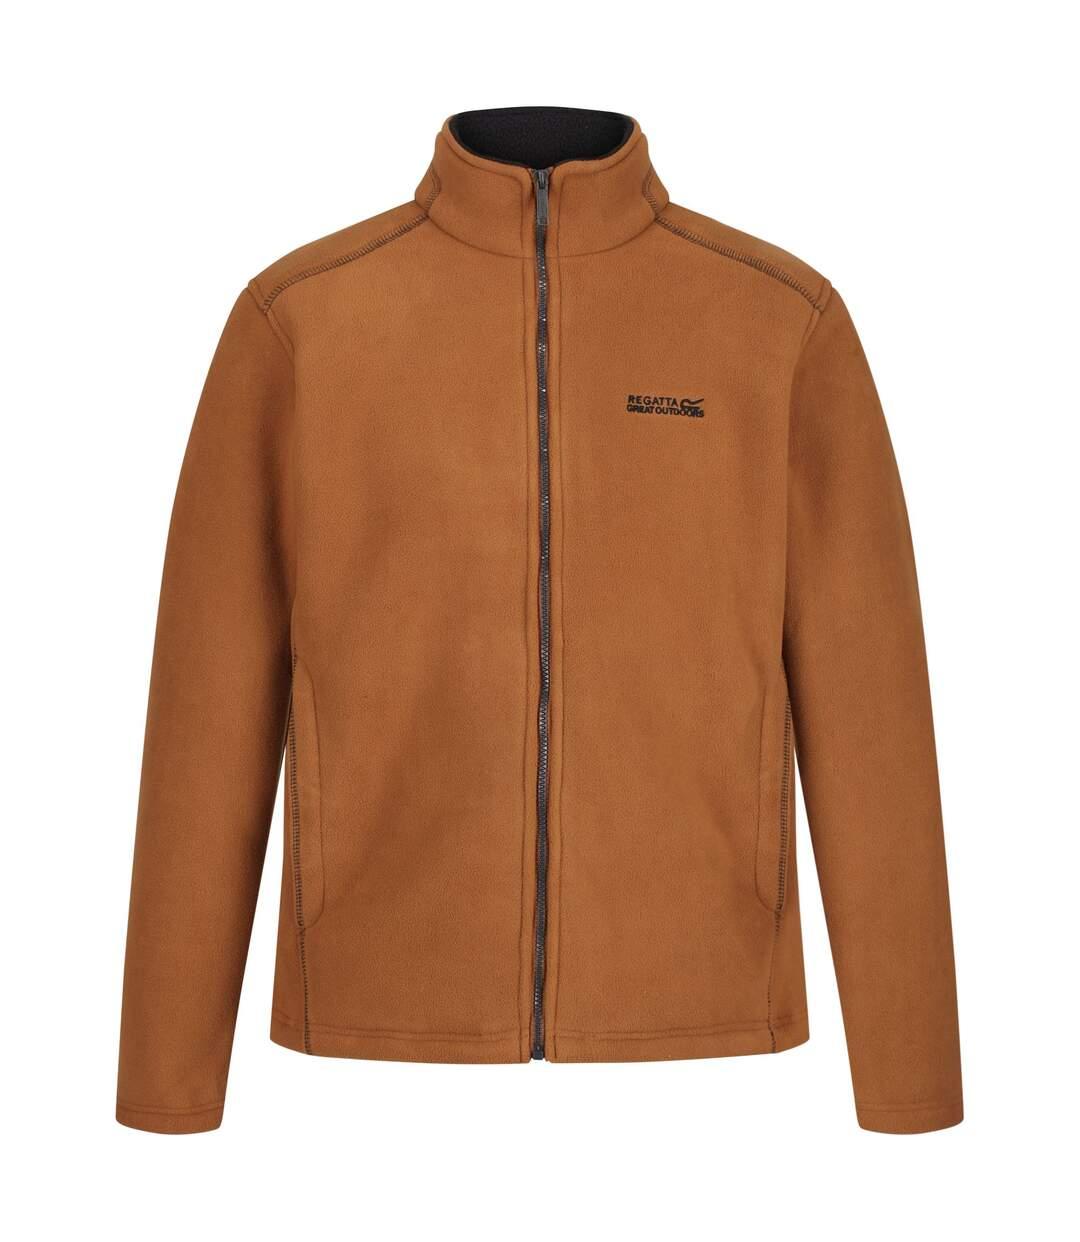 Regatta Mens Garrian Full Zip Jacket (Tan/Black) - UTRG3647